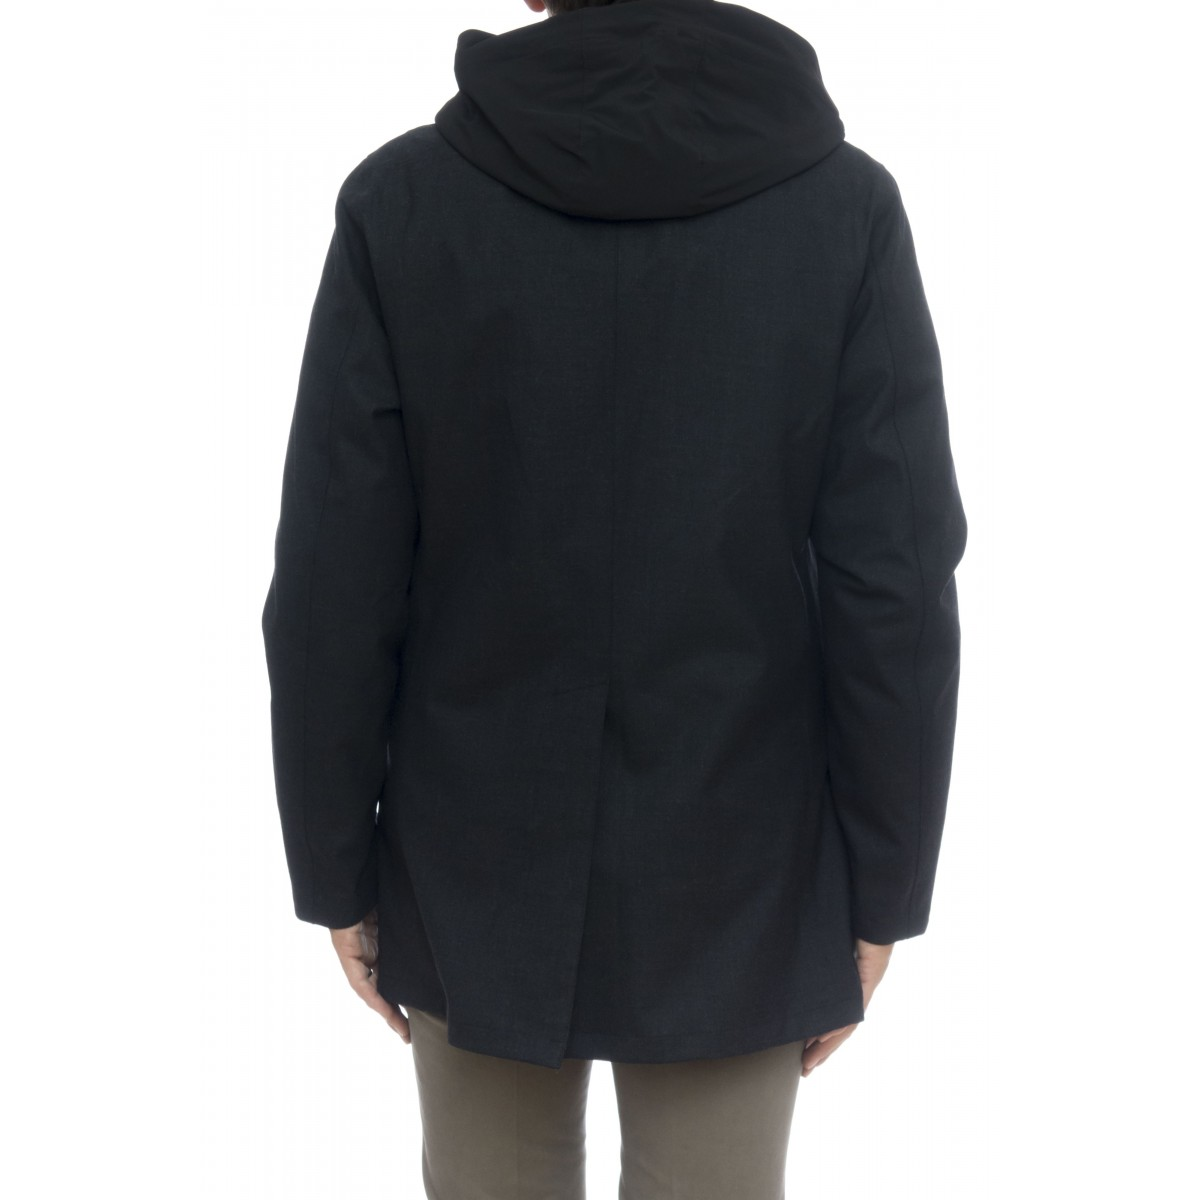 Piumino - Hachiko pw1038 trence tecno lana